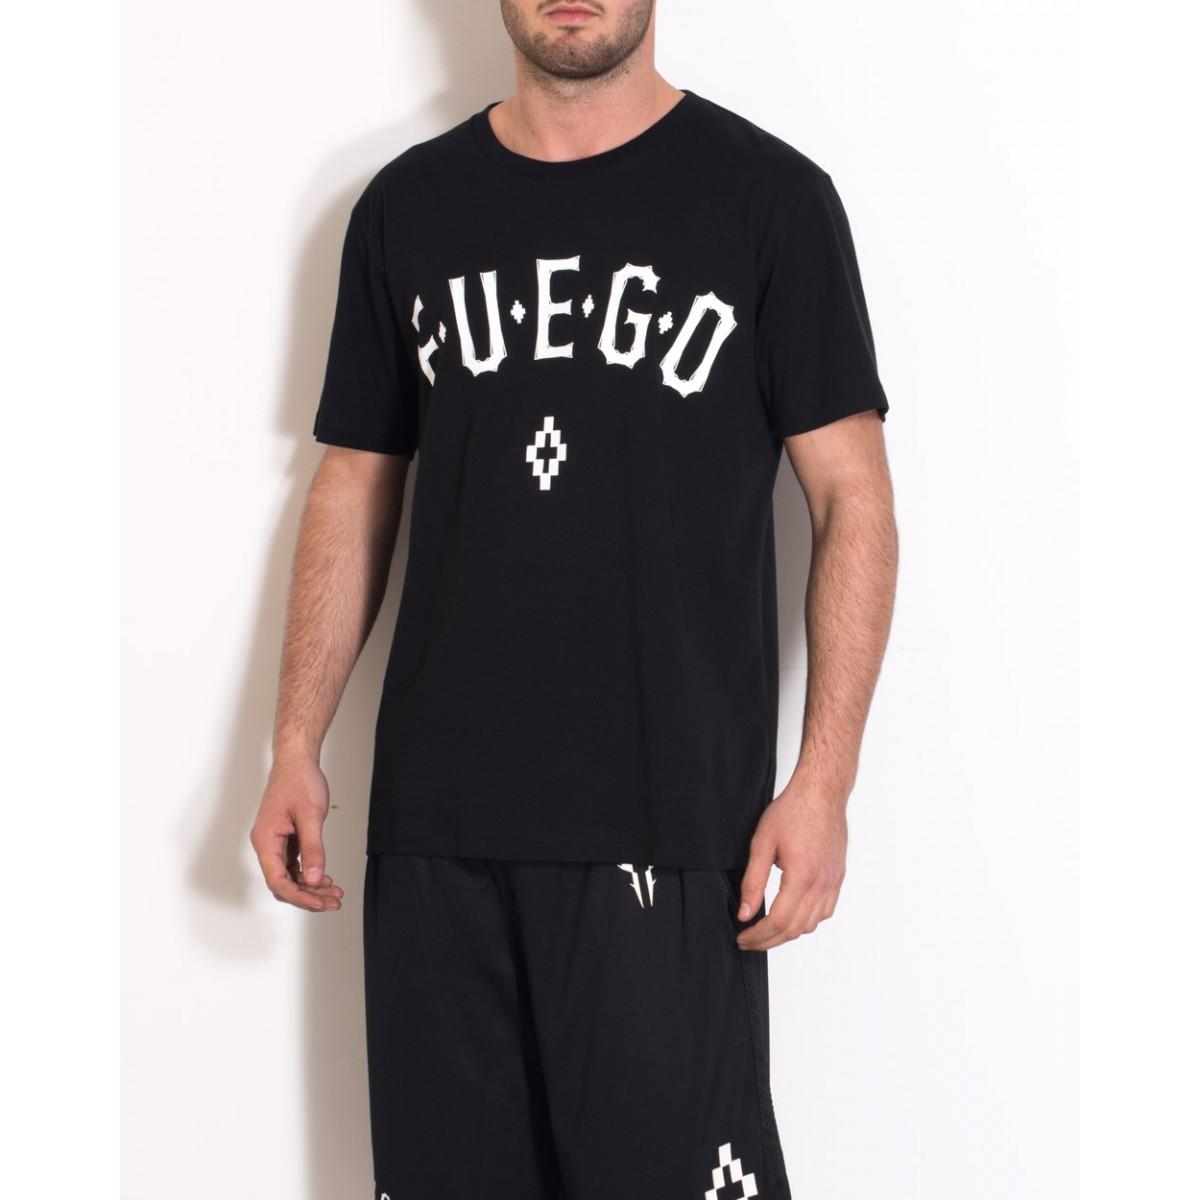 Fuego clothing store